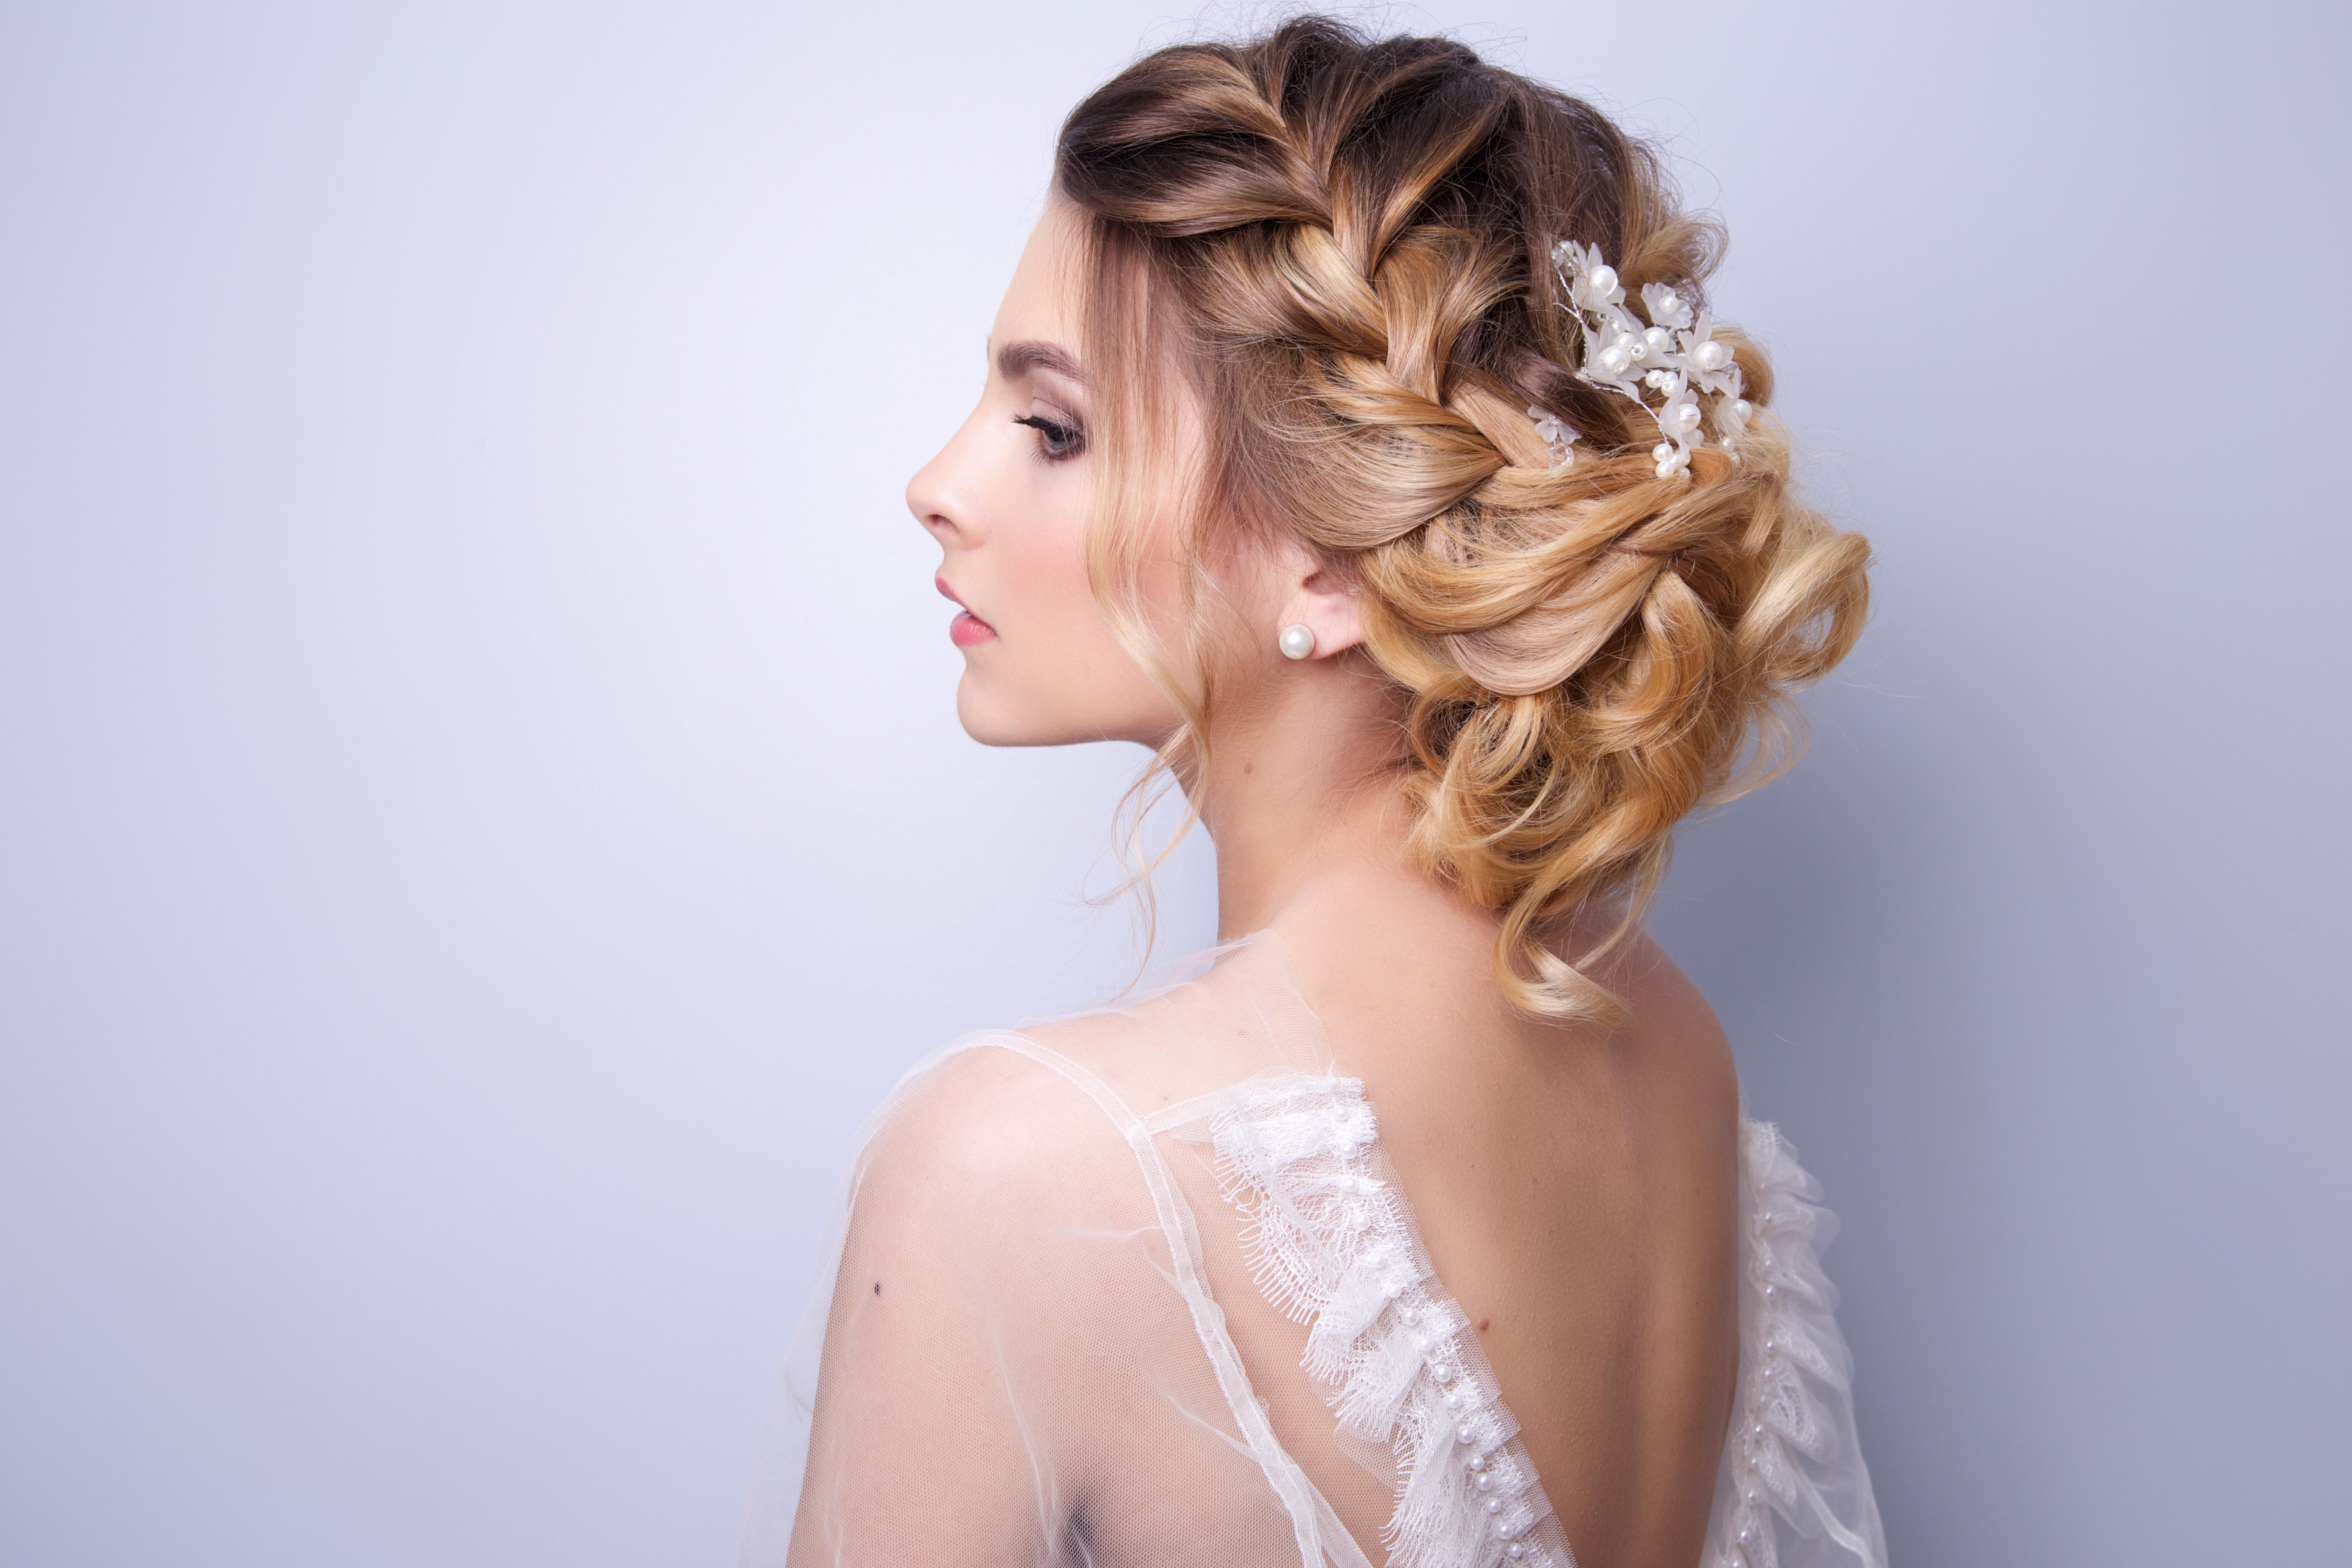 10 Bridal Hairstyle Ideas For Fine Hair